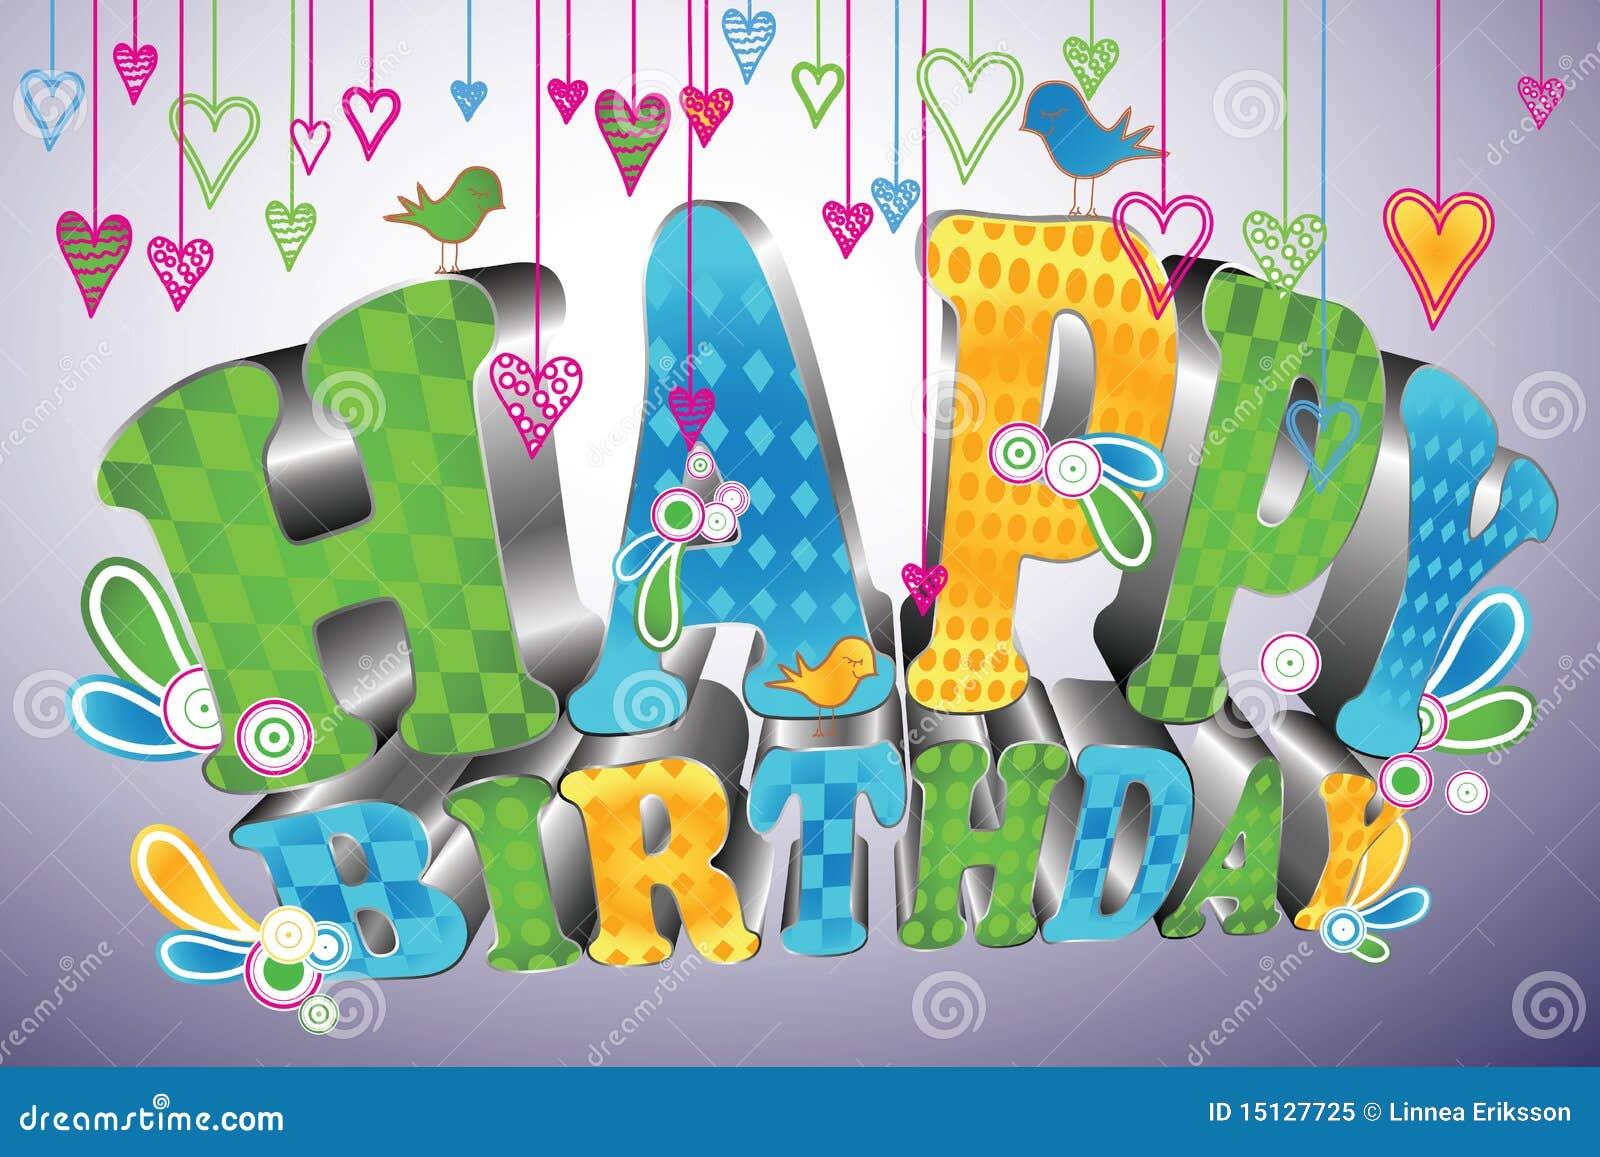 Glossy 3d Type: Happy Birthday Stock Vector